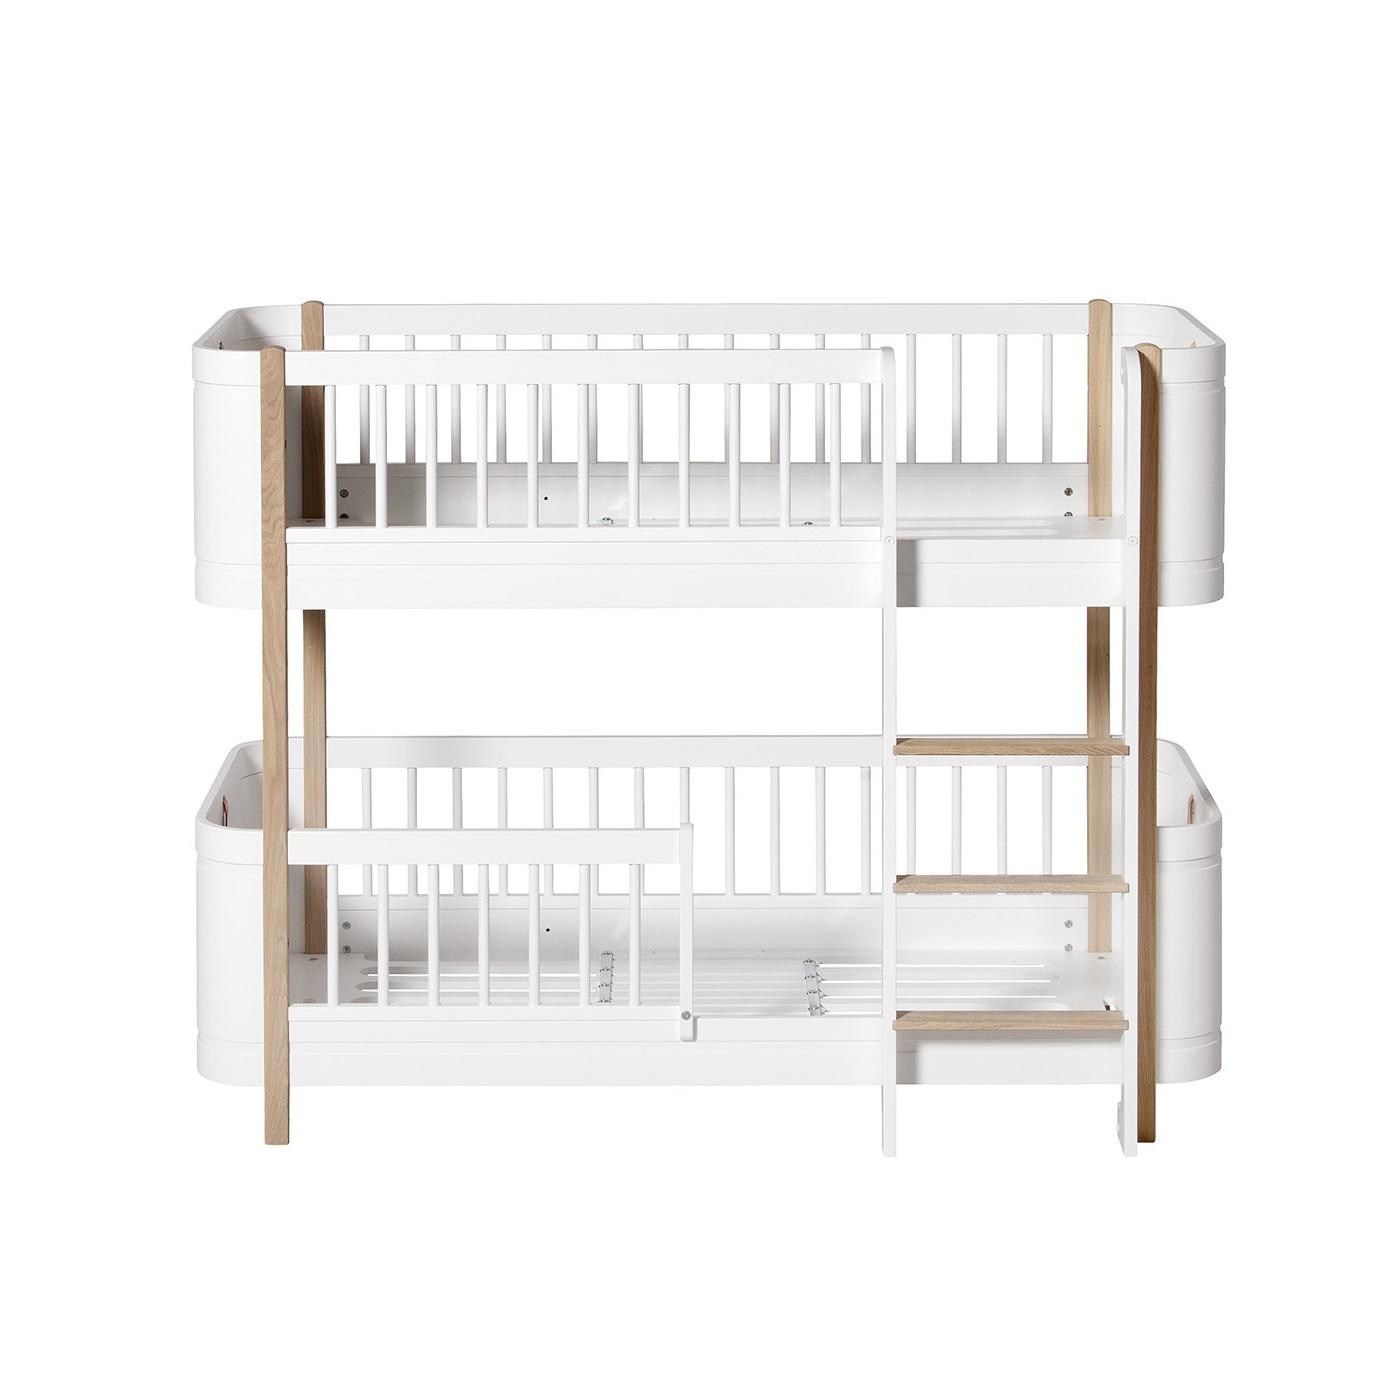 Våningssäng WOOD MINI+ vit/ek, Oliver Furniture